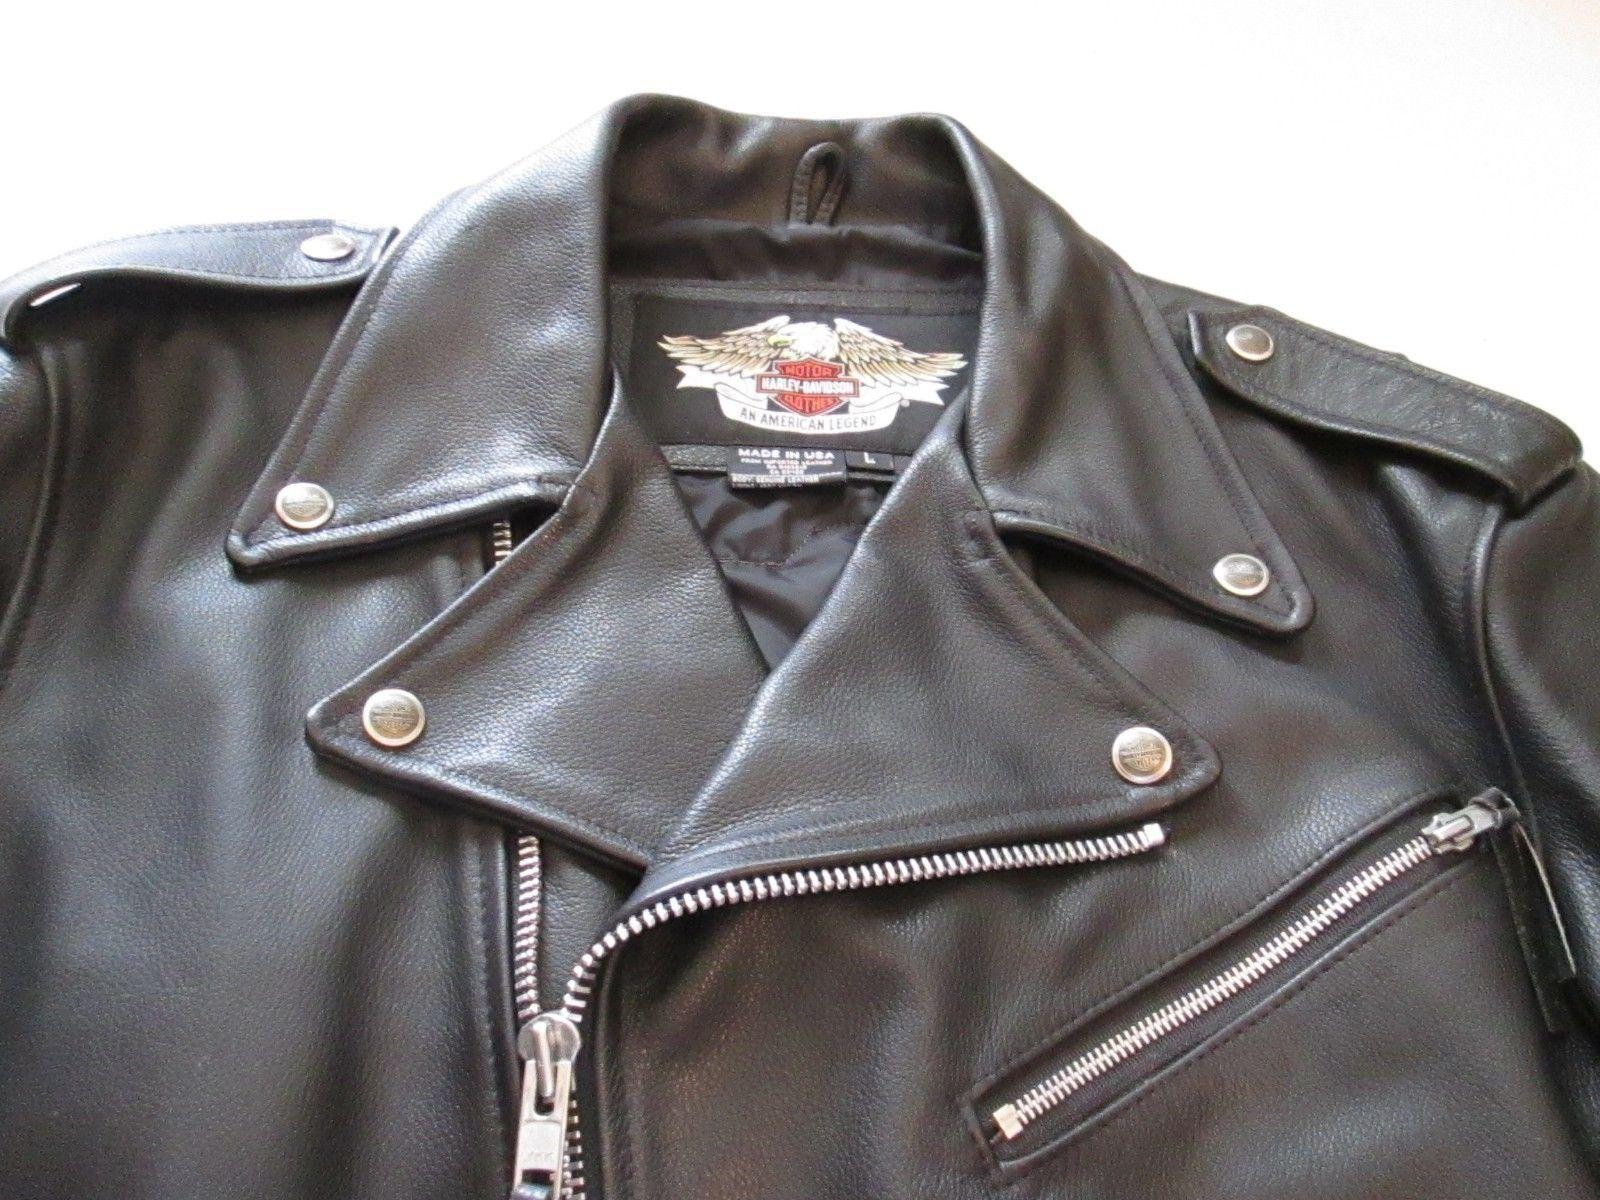 Harley Davidson Mens Basic Skins Flag Leather Jacket W Patch Size L Made In Usa Leather Jacket Harley Davidson Jackets